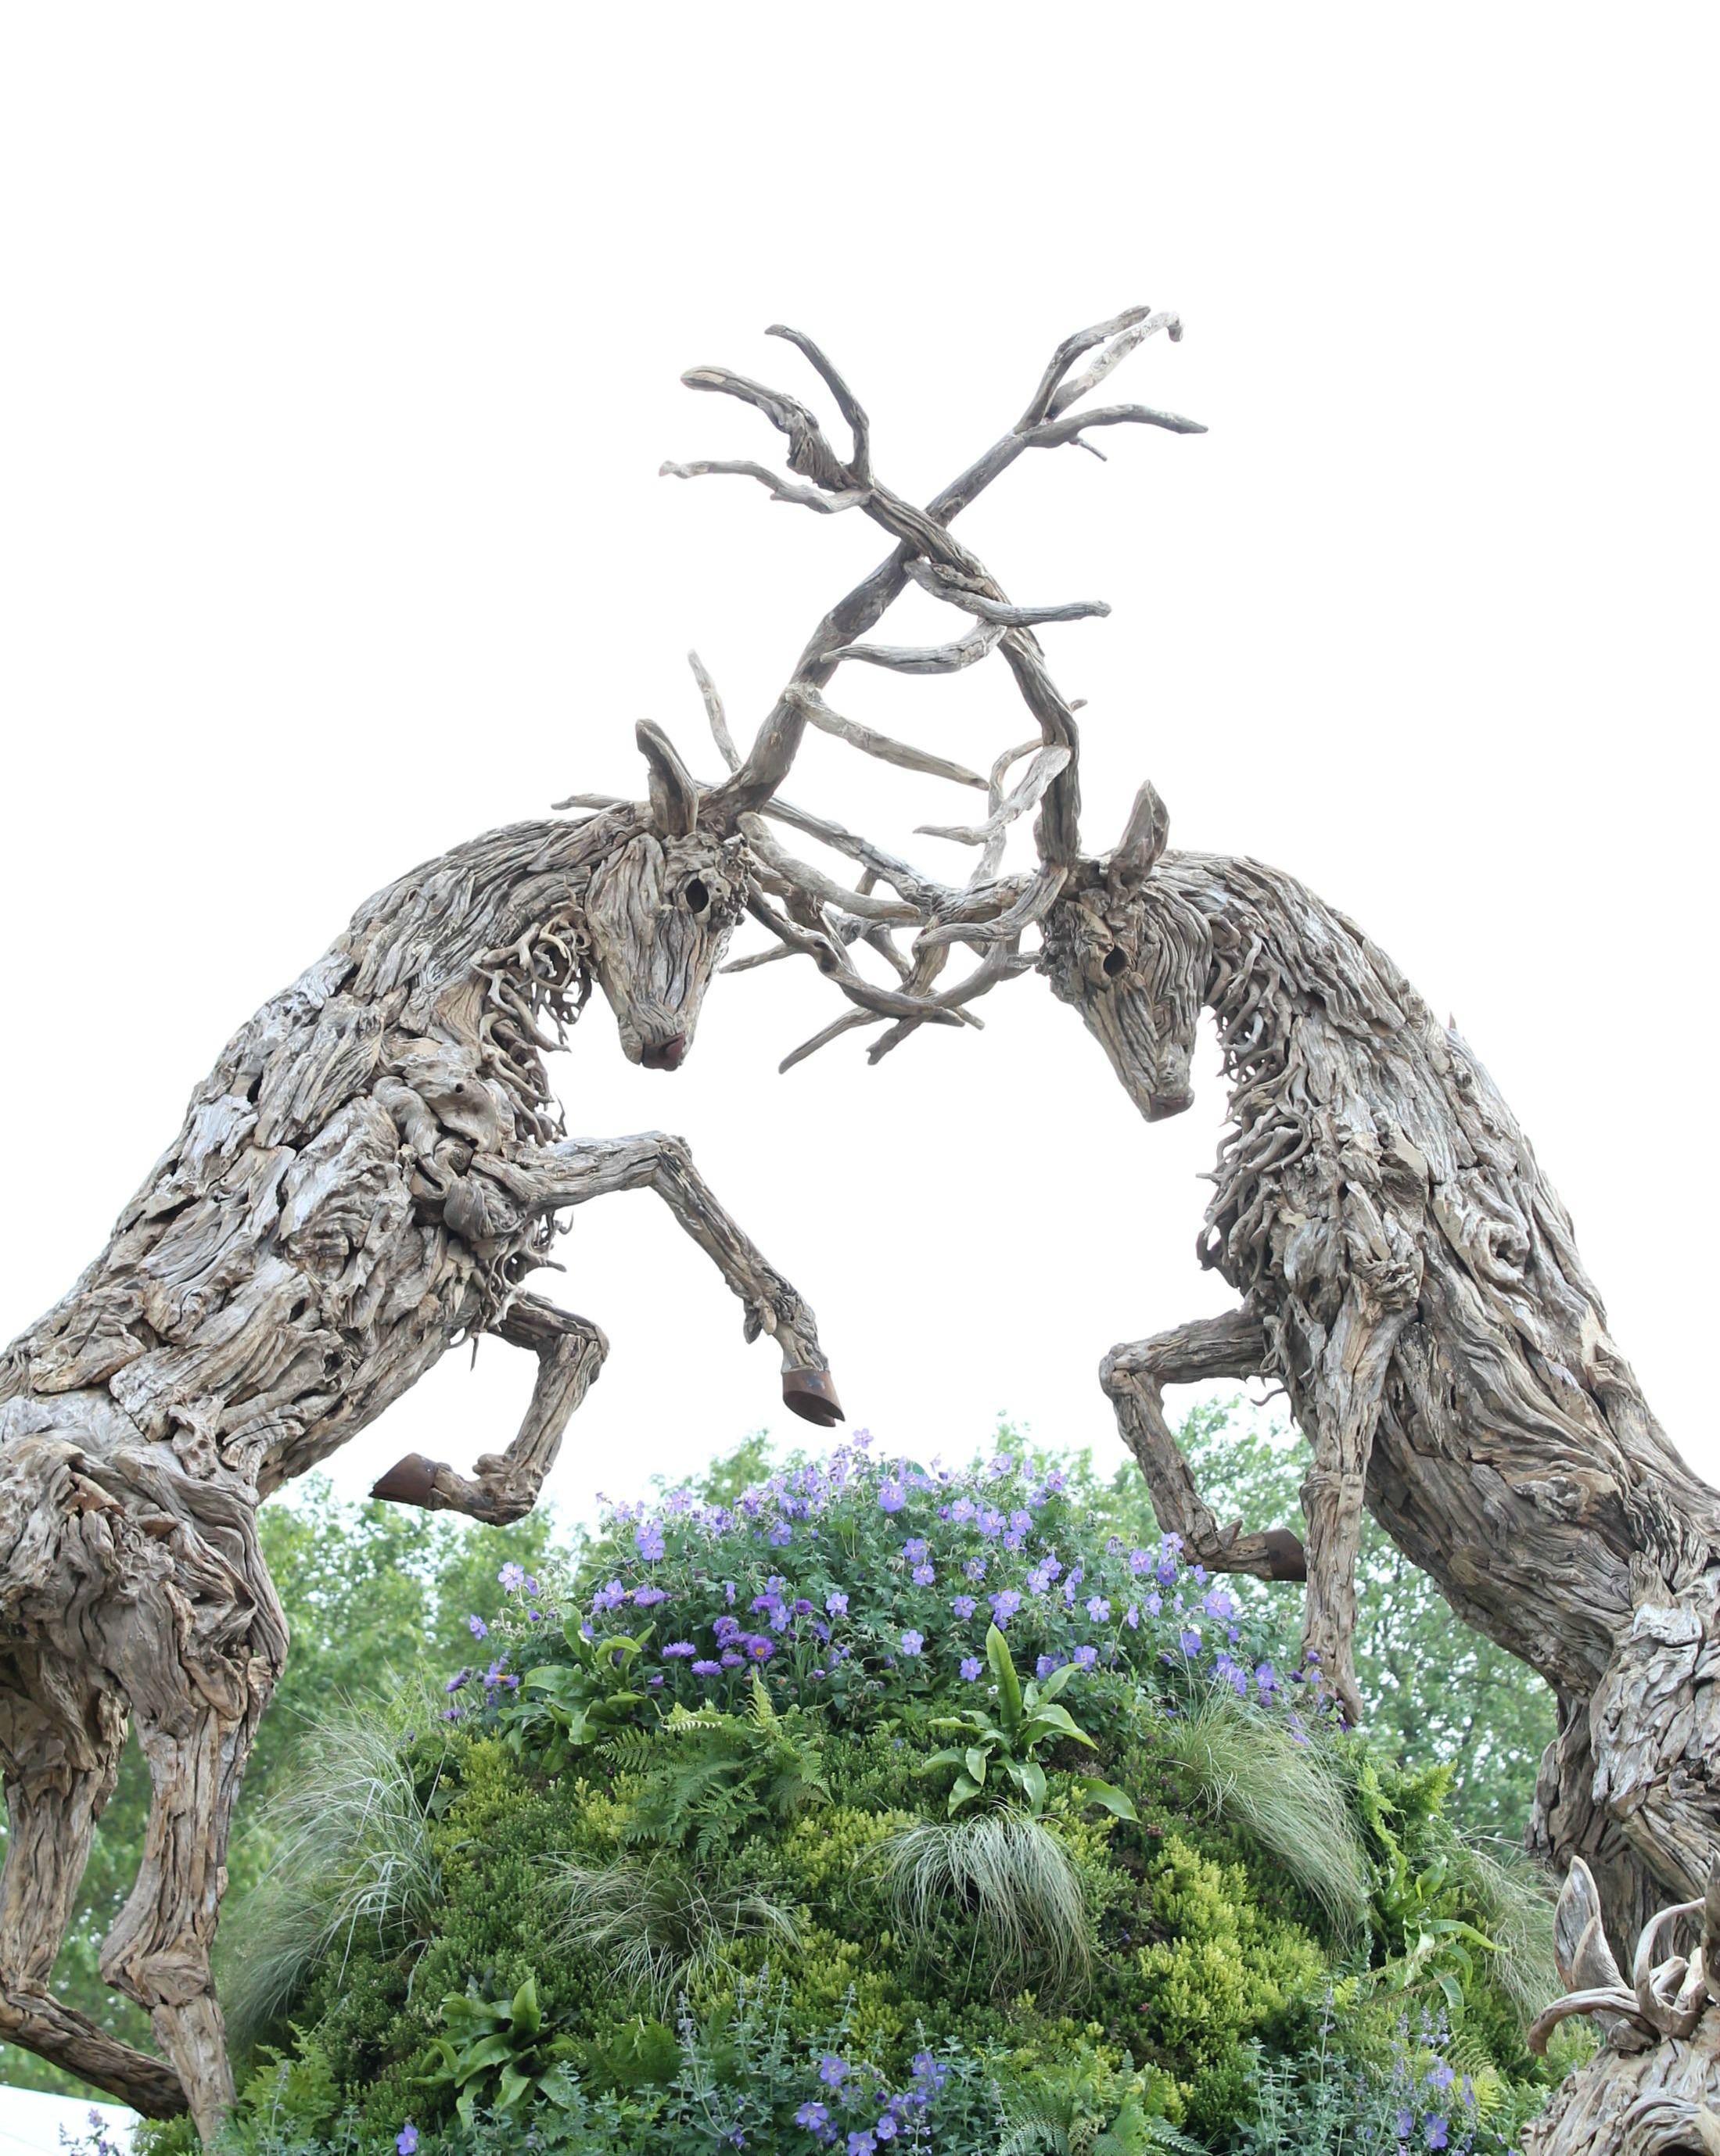 Driftwood-sculpture-by-James-Doran-Webb-Chelsea-Flower-Show-2016-photo-by-Geraldine-Tan-of-Little-big-Bell